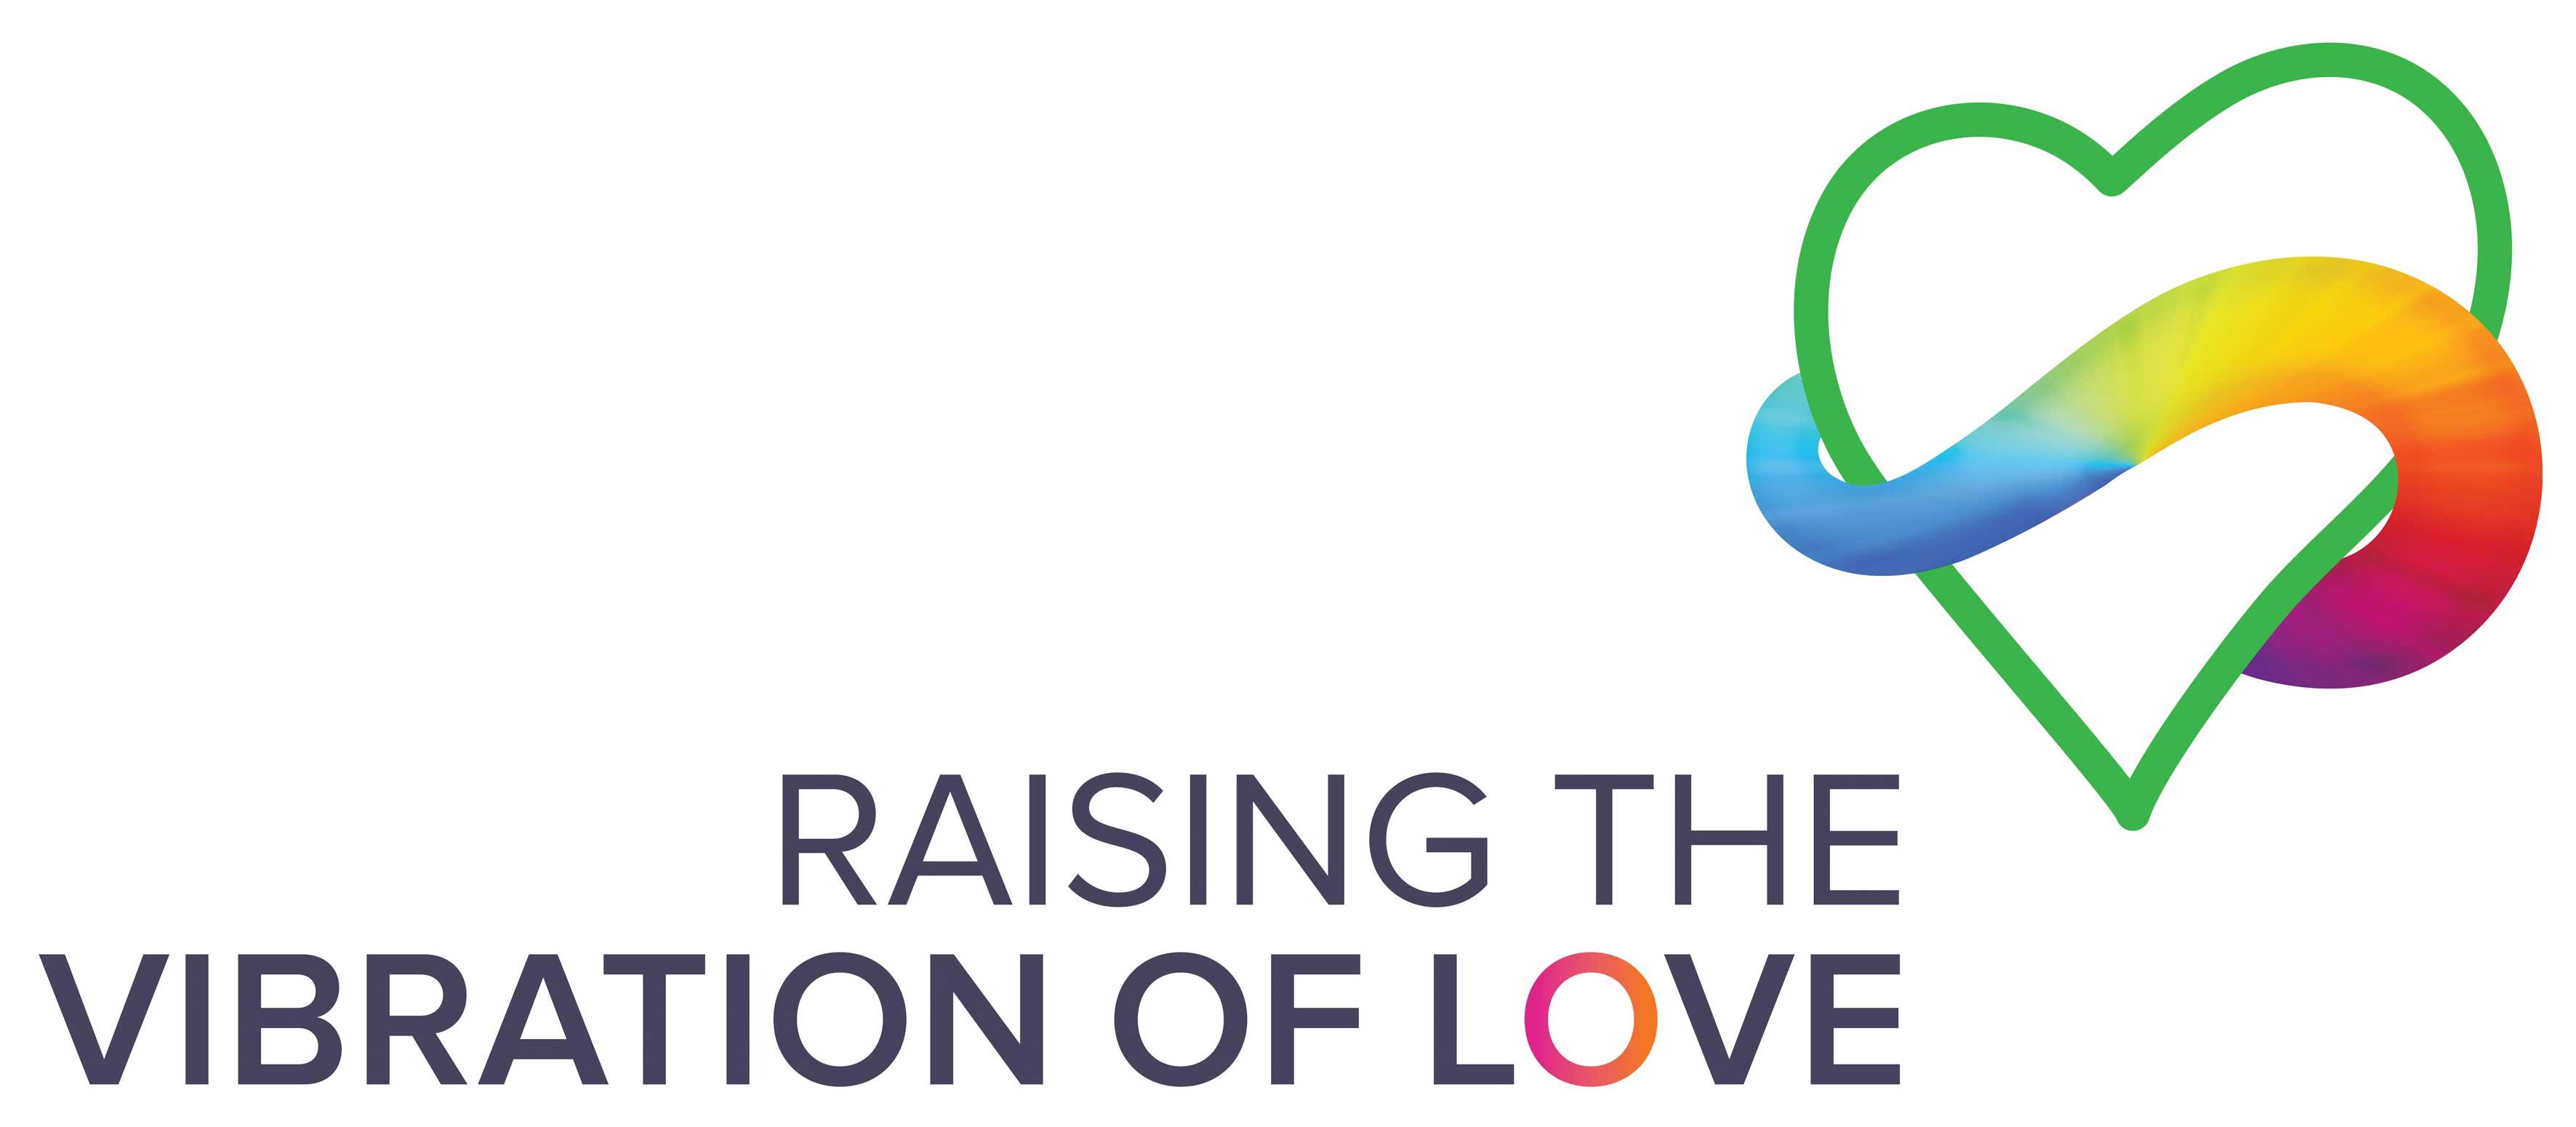 Raising the Vibration of Love